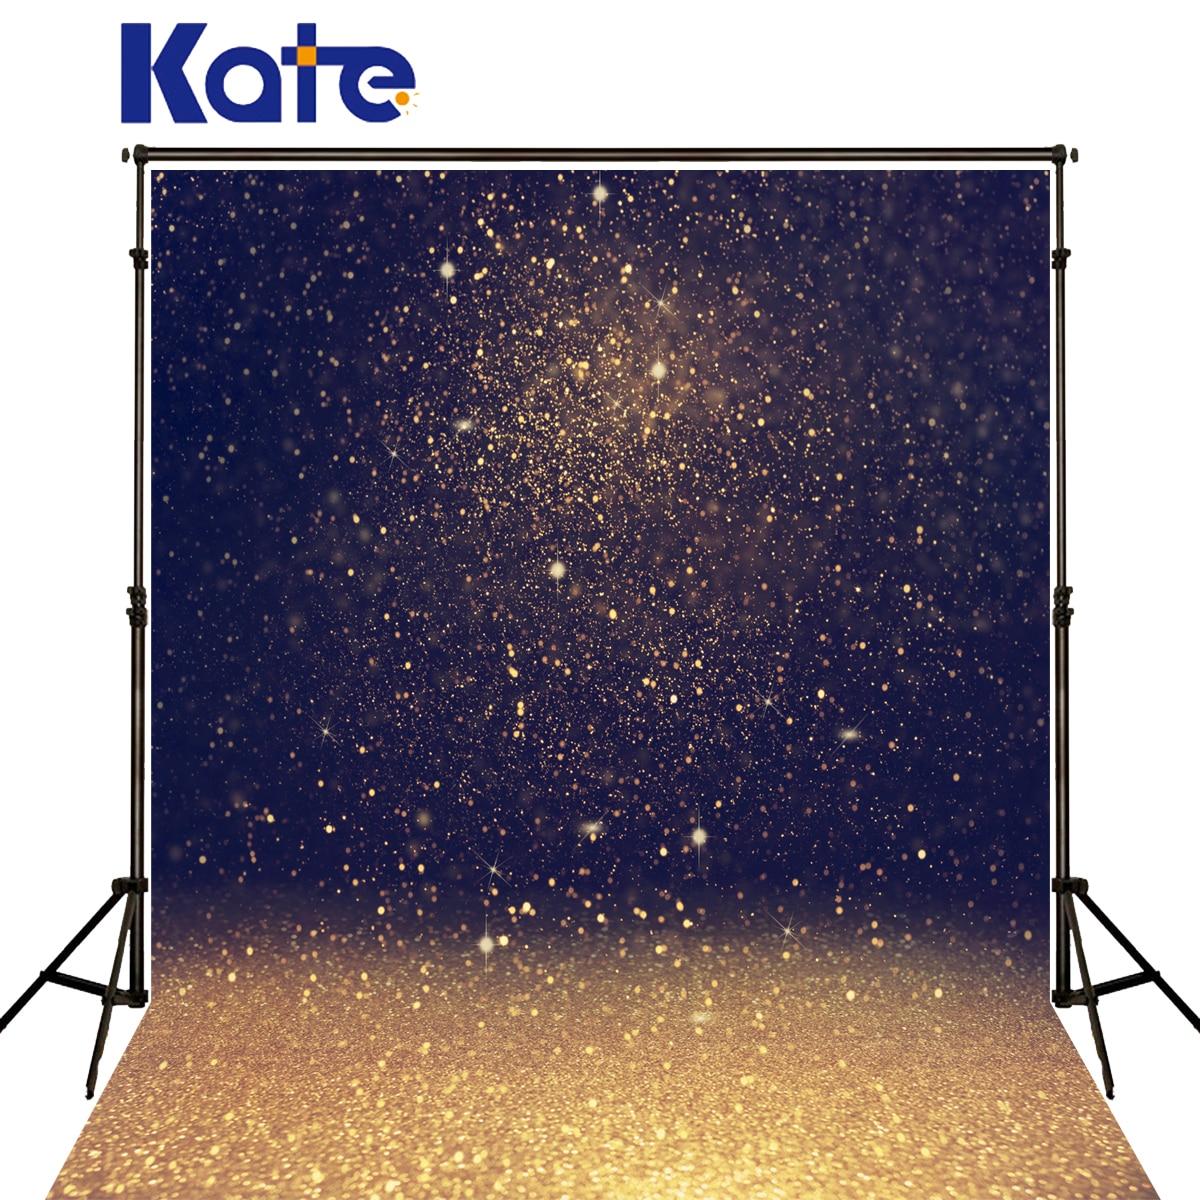 Kate Christmas Backdrop Photography Gold Spot Dream Fundo Fotografico Madeira Lighting Night Fall Background For Photo Shoot<br>